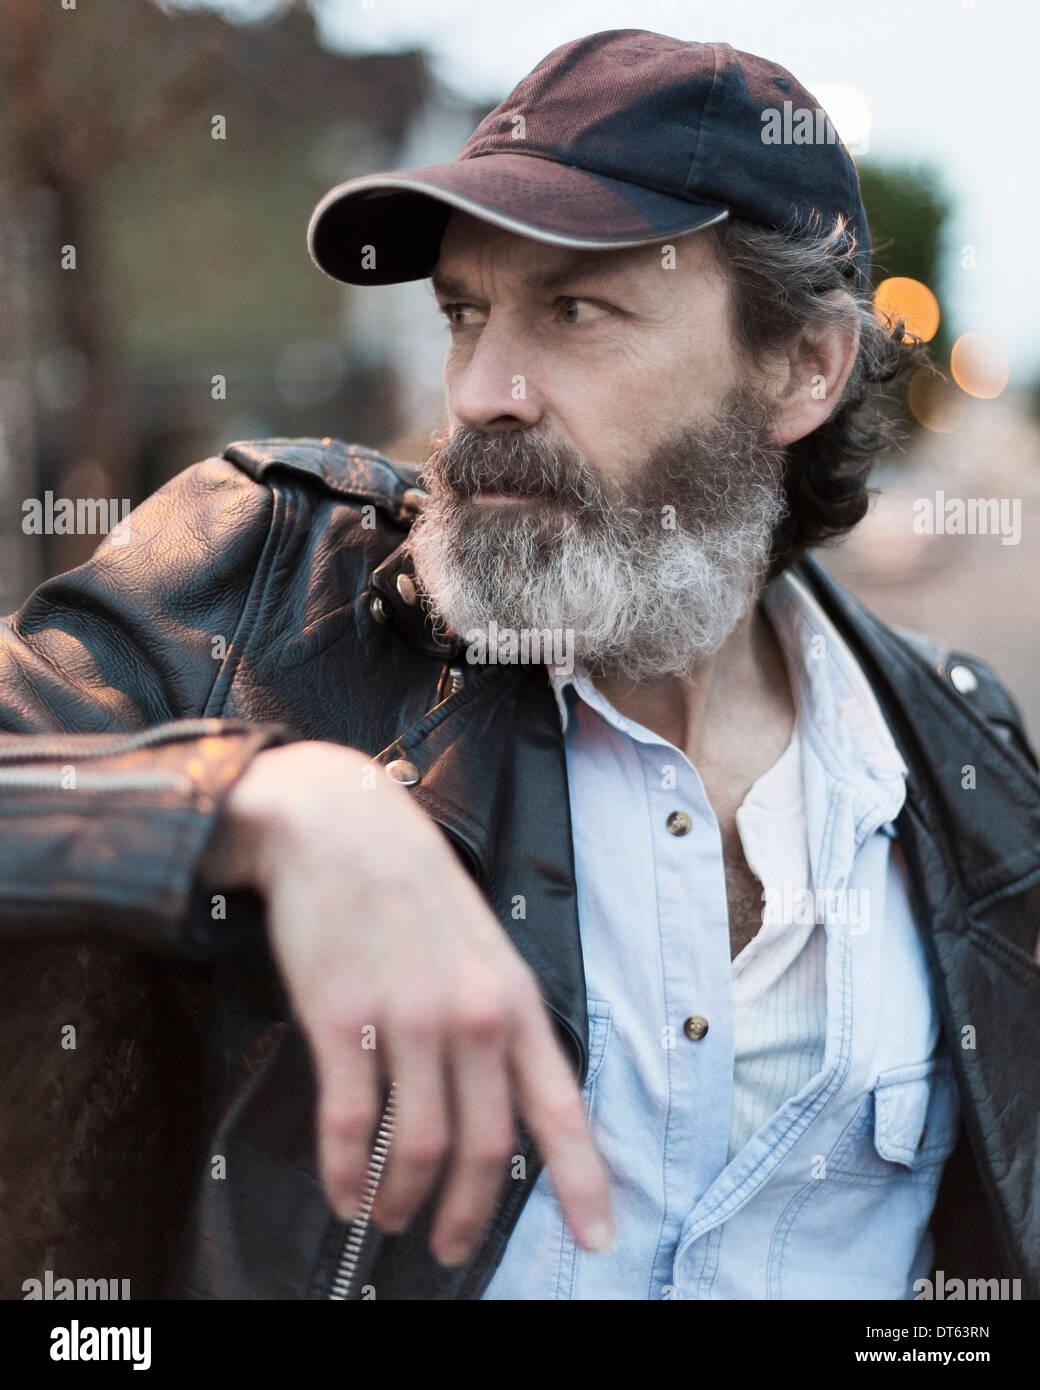 8910db950dd Mature man wearing baseball cap Stock Photo  66517577 - Alamy